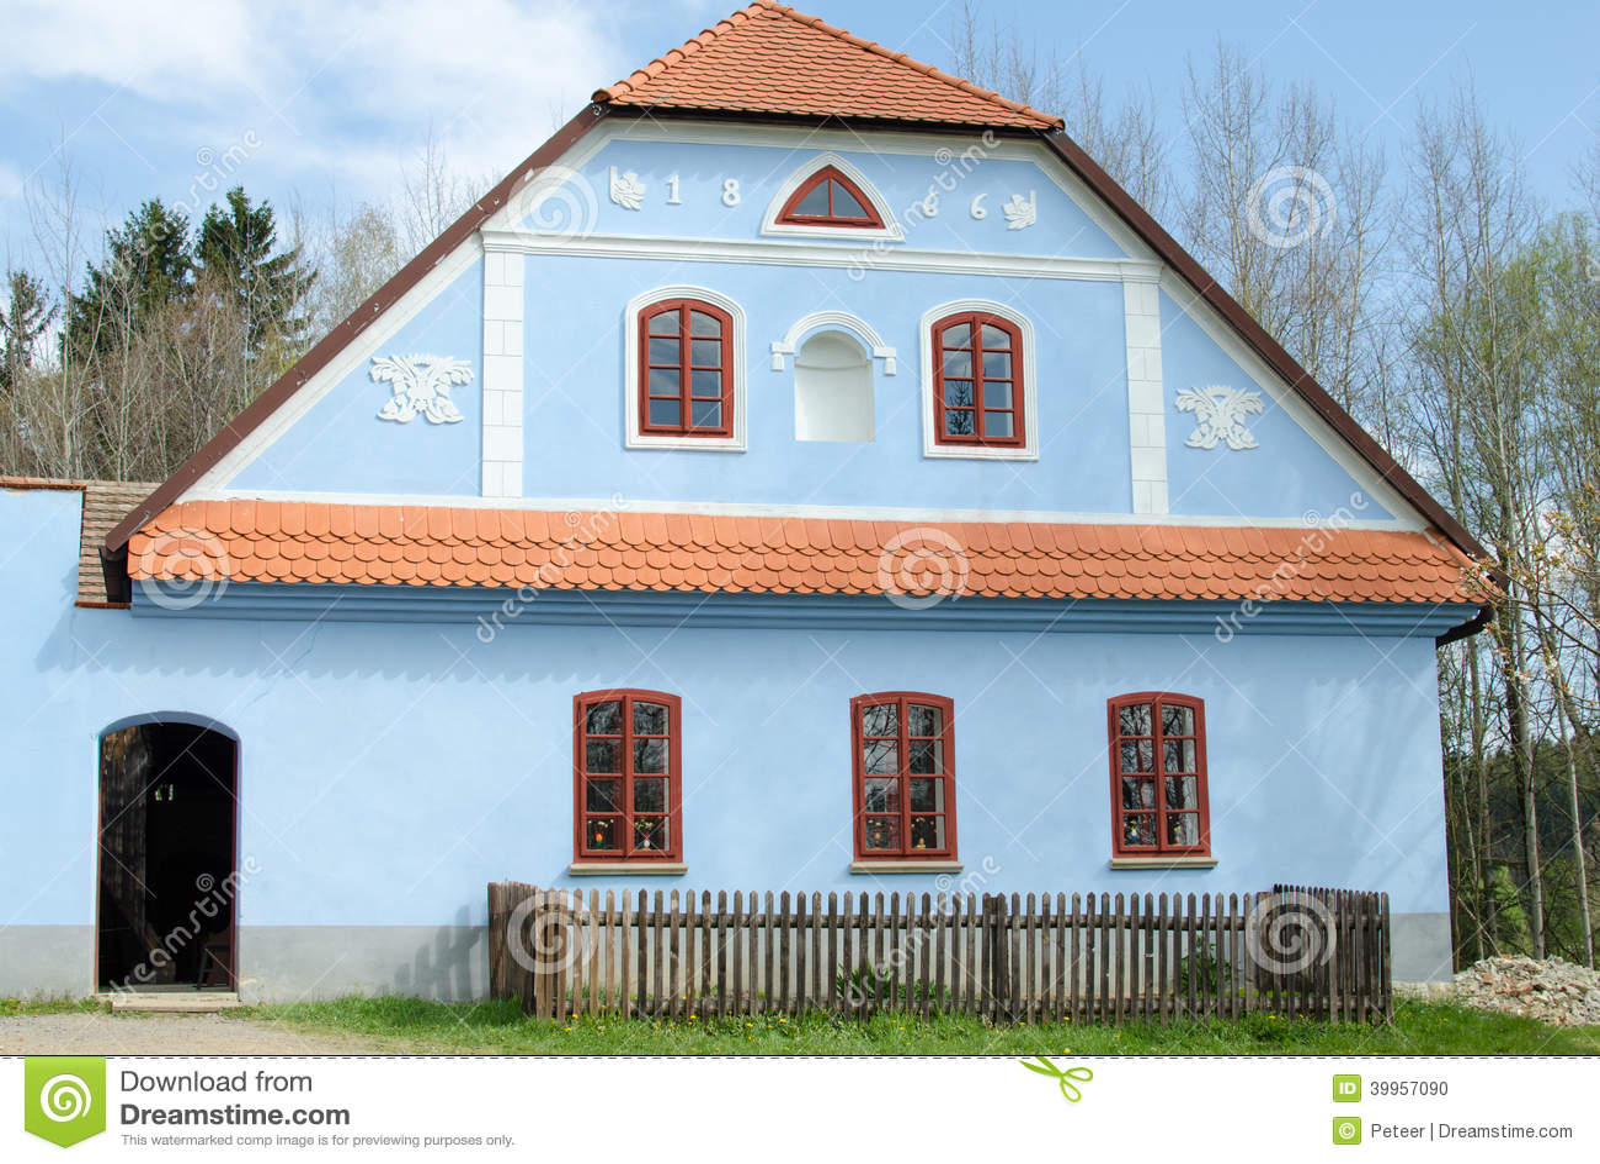 Oud blauw huis stock foto afbeelding 39957090 - Huis verlenging oud huis ...